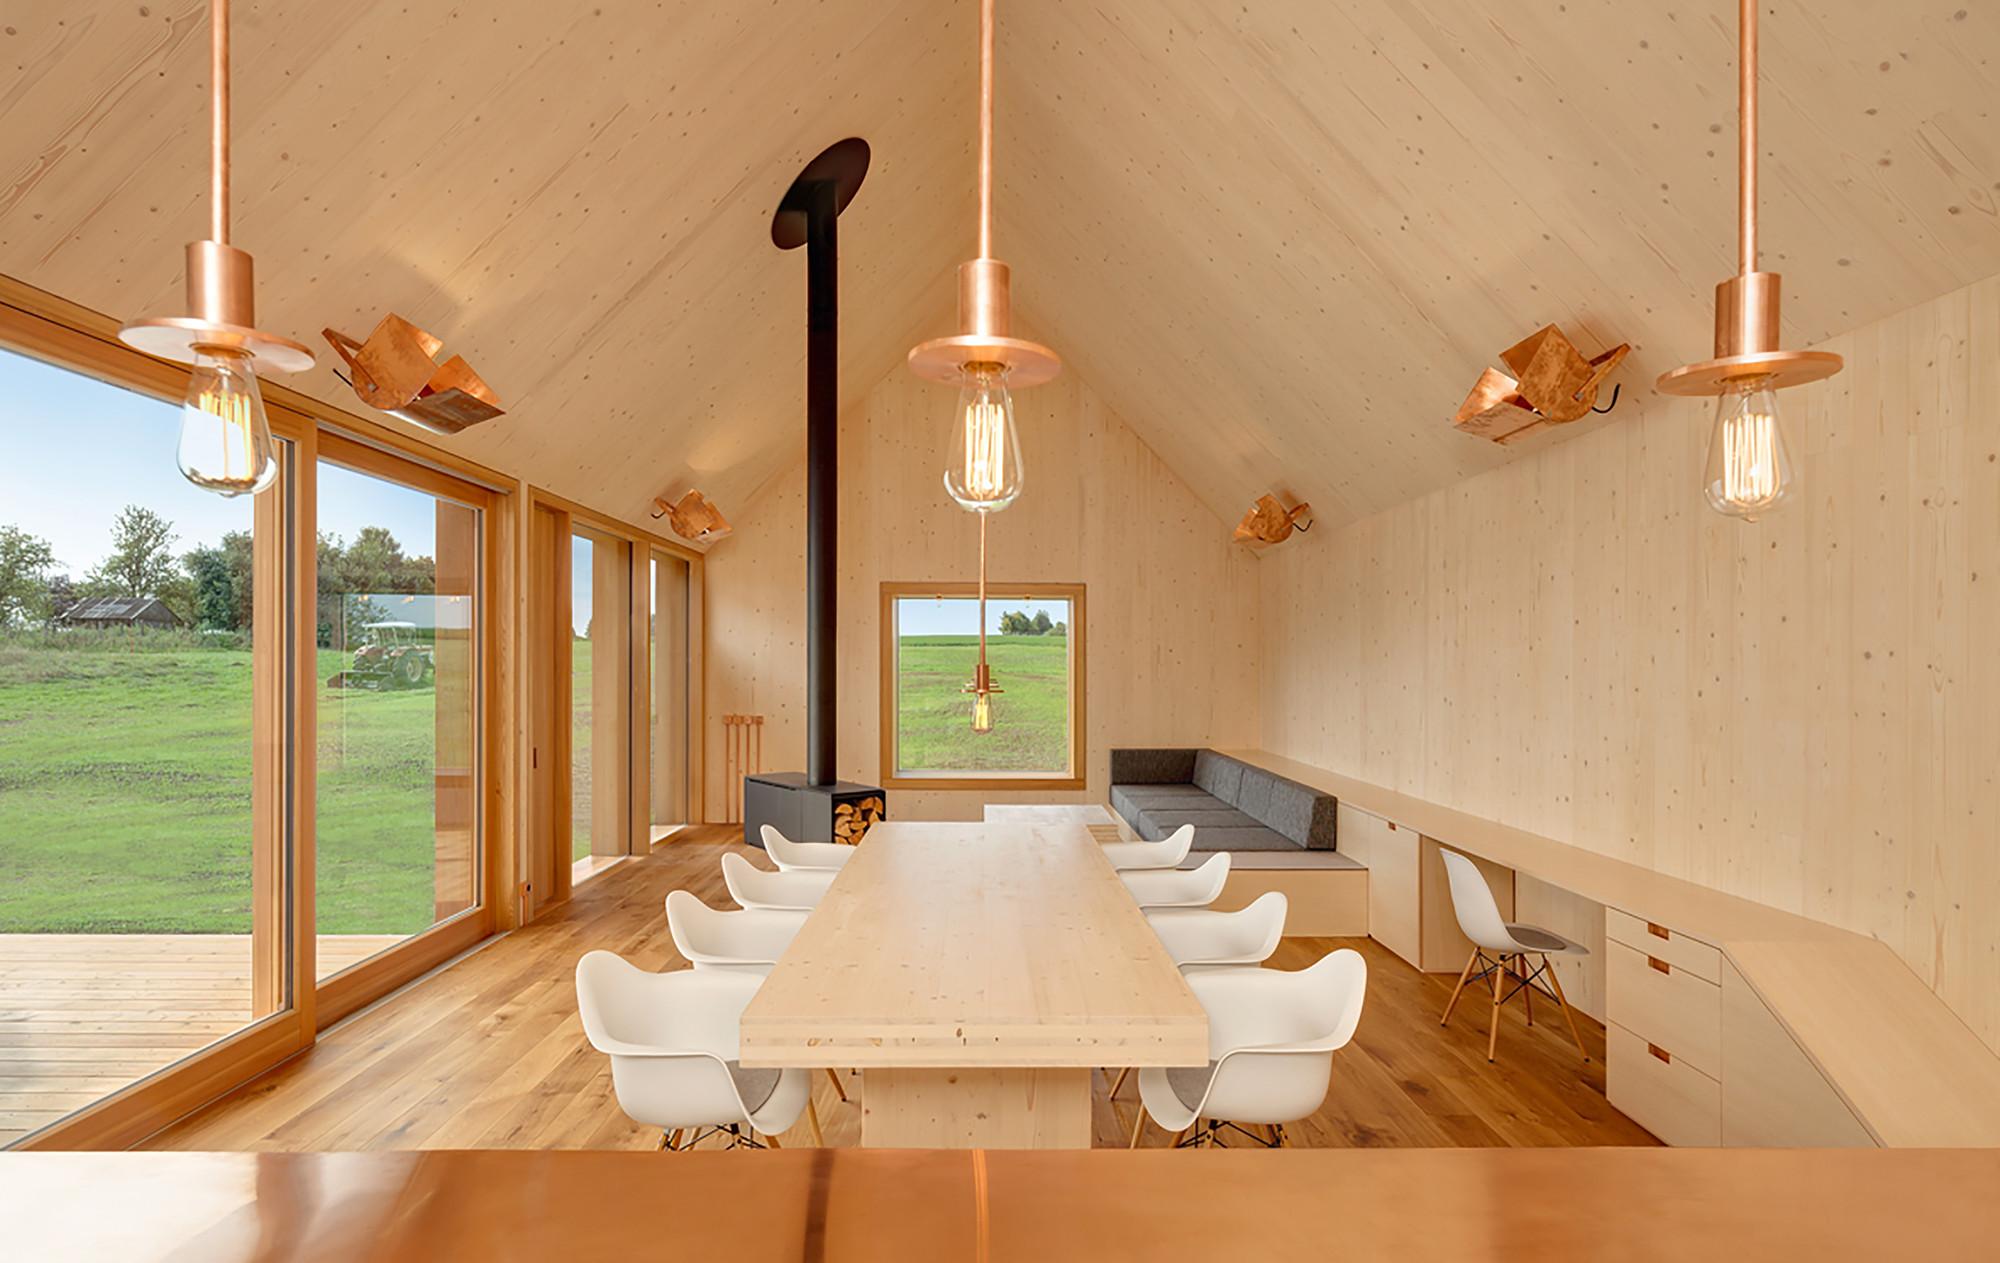 Gallery of Timber House  KHNLEIN Architektur  9